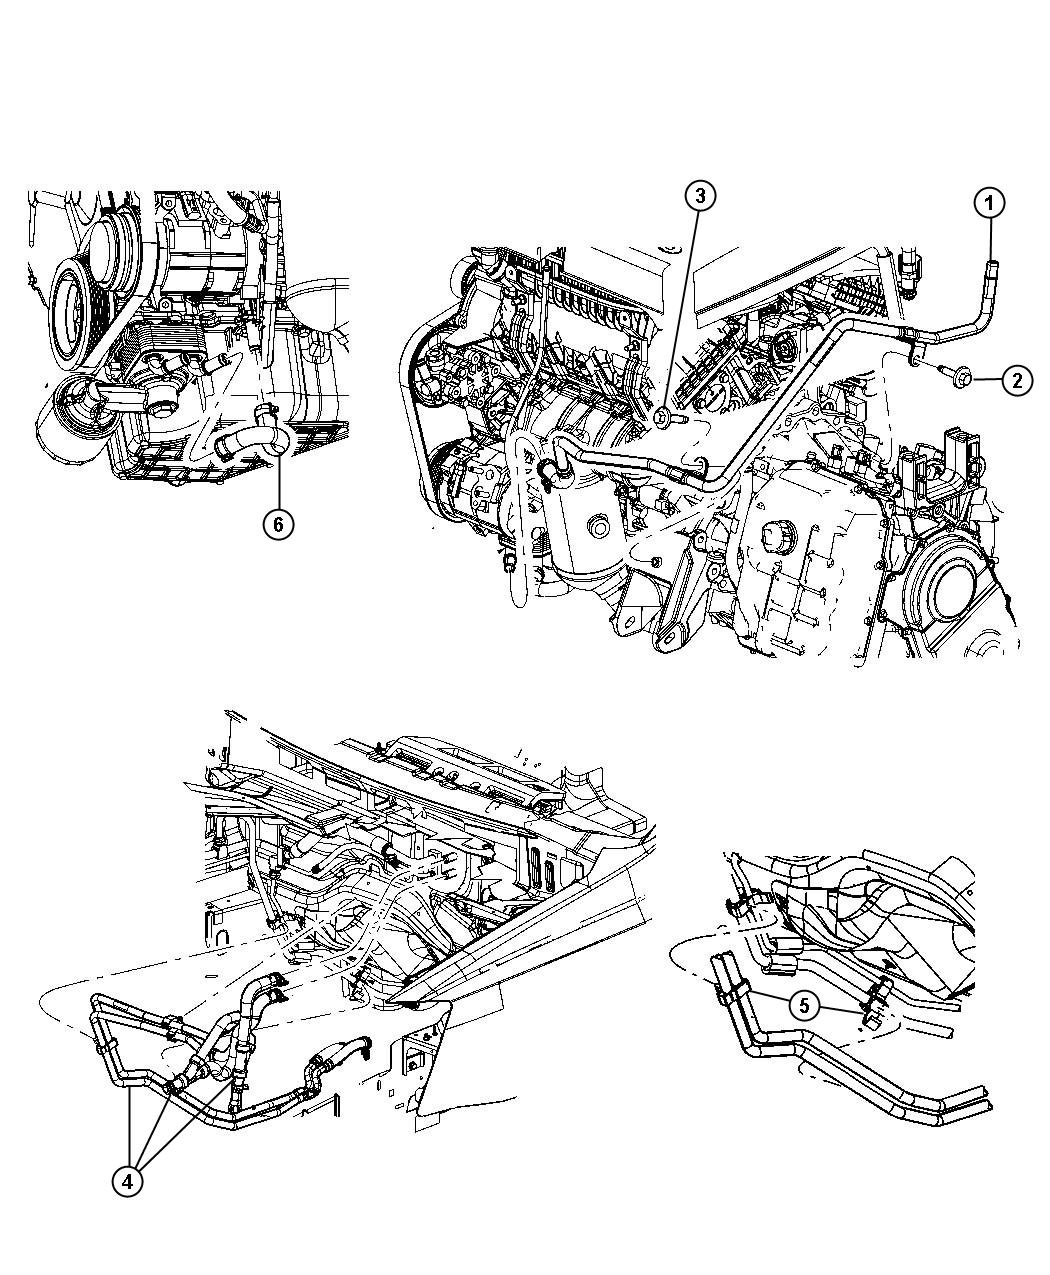 Heater Plumbing 4 0l 4 0l V6 Sohc Engine